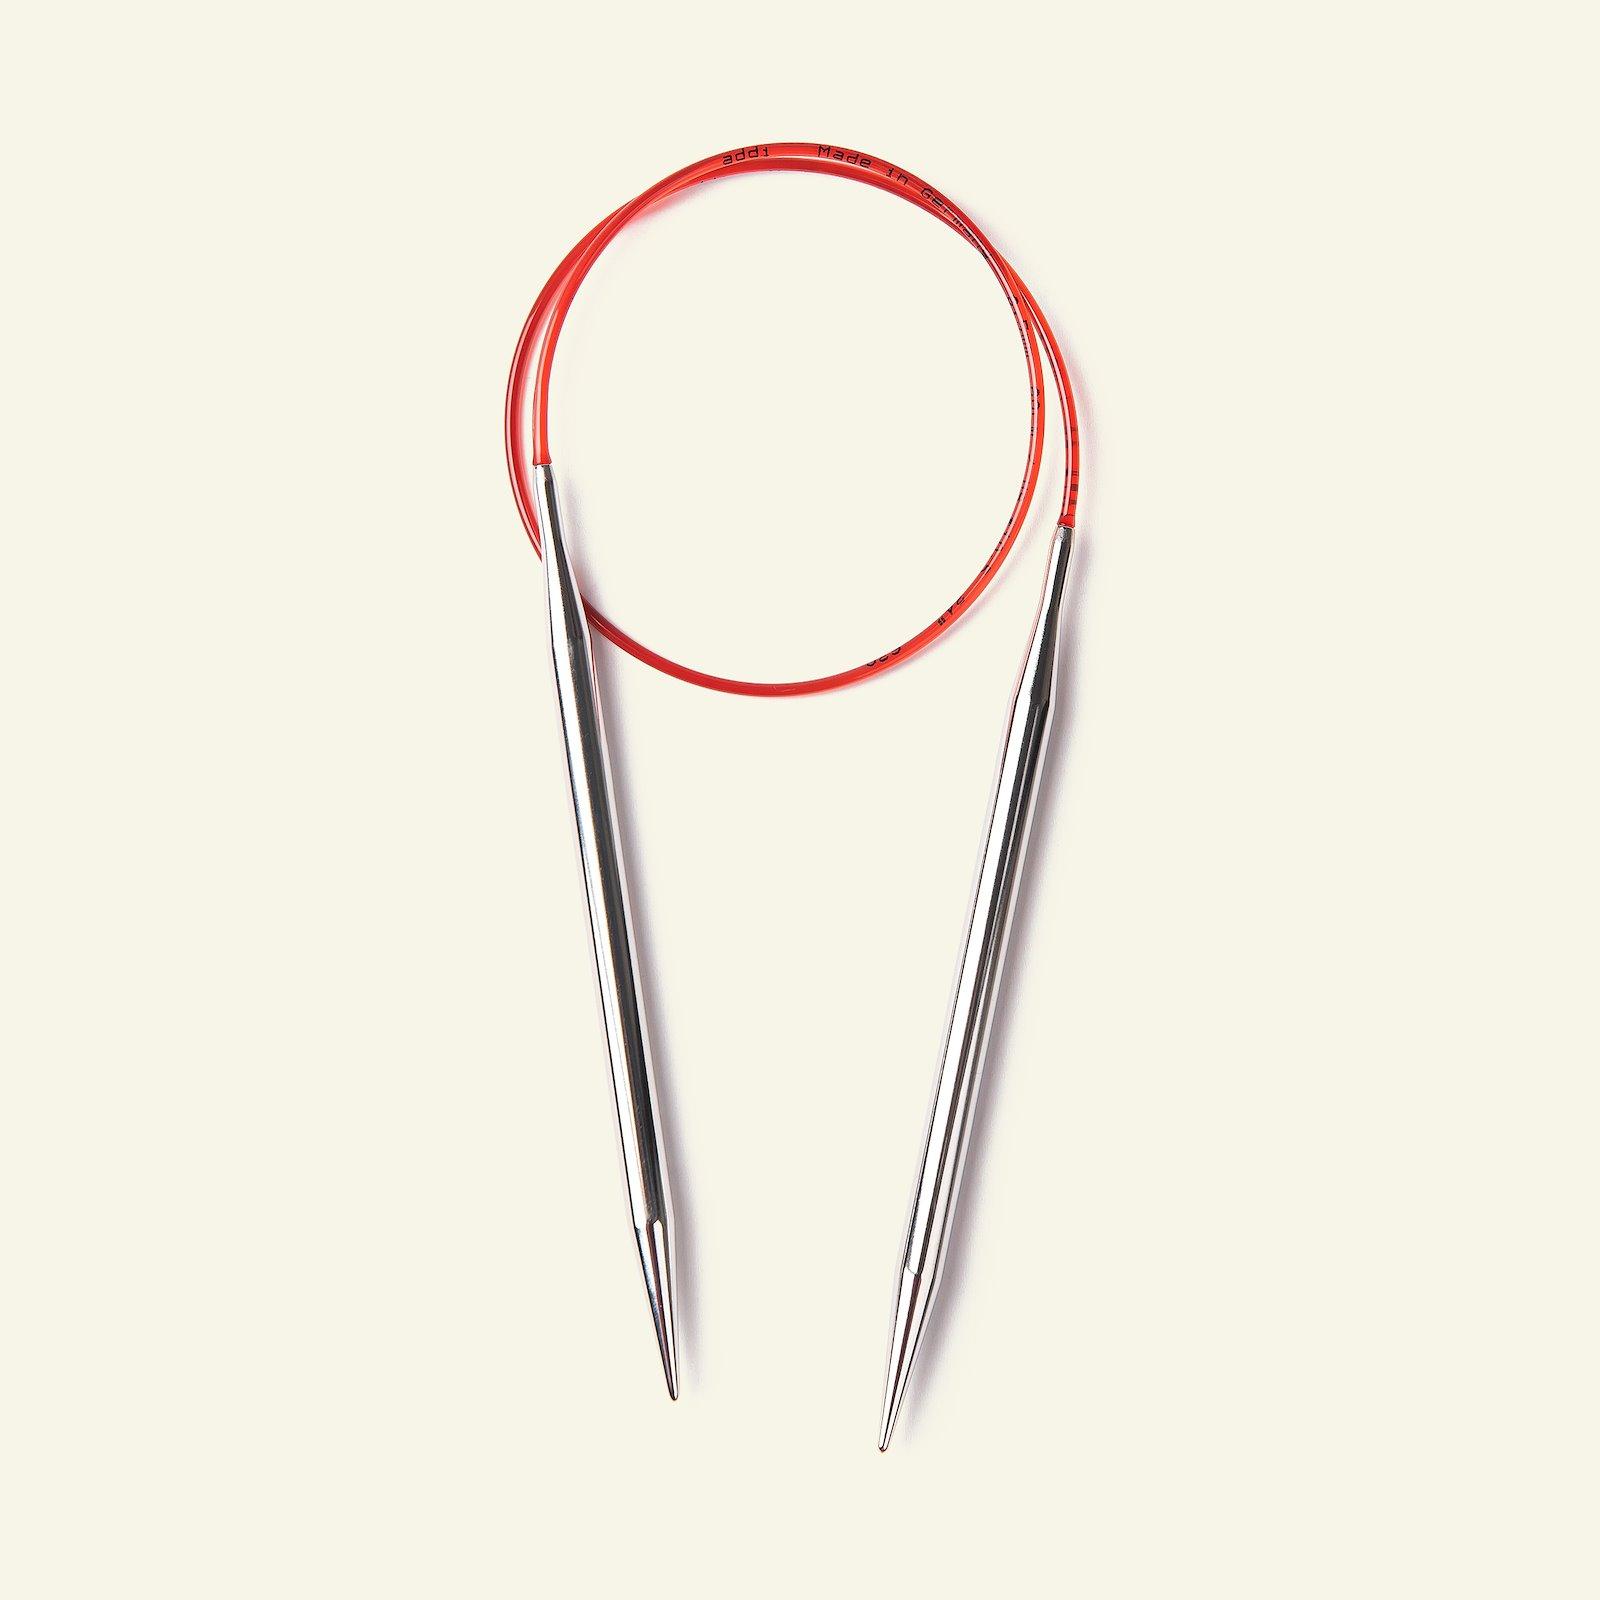 Addi Lace circular needle 60cm 8mm 83215_pack